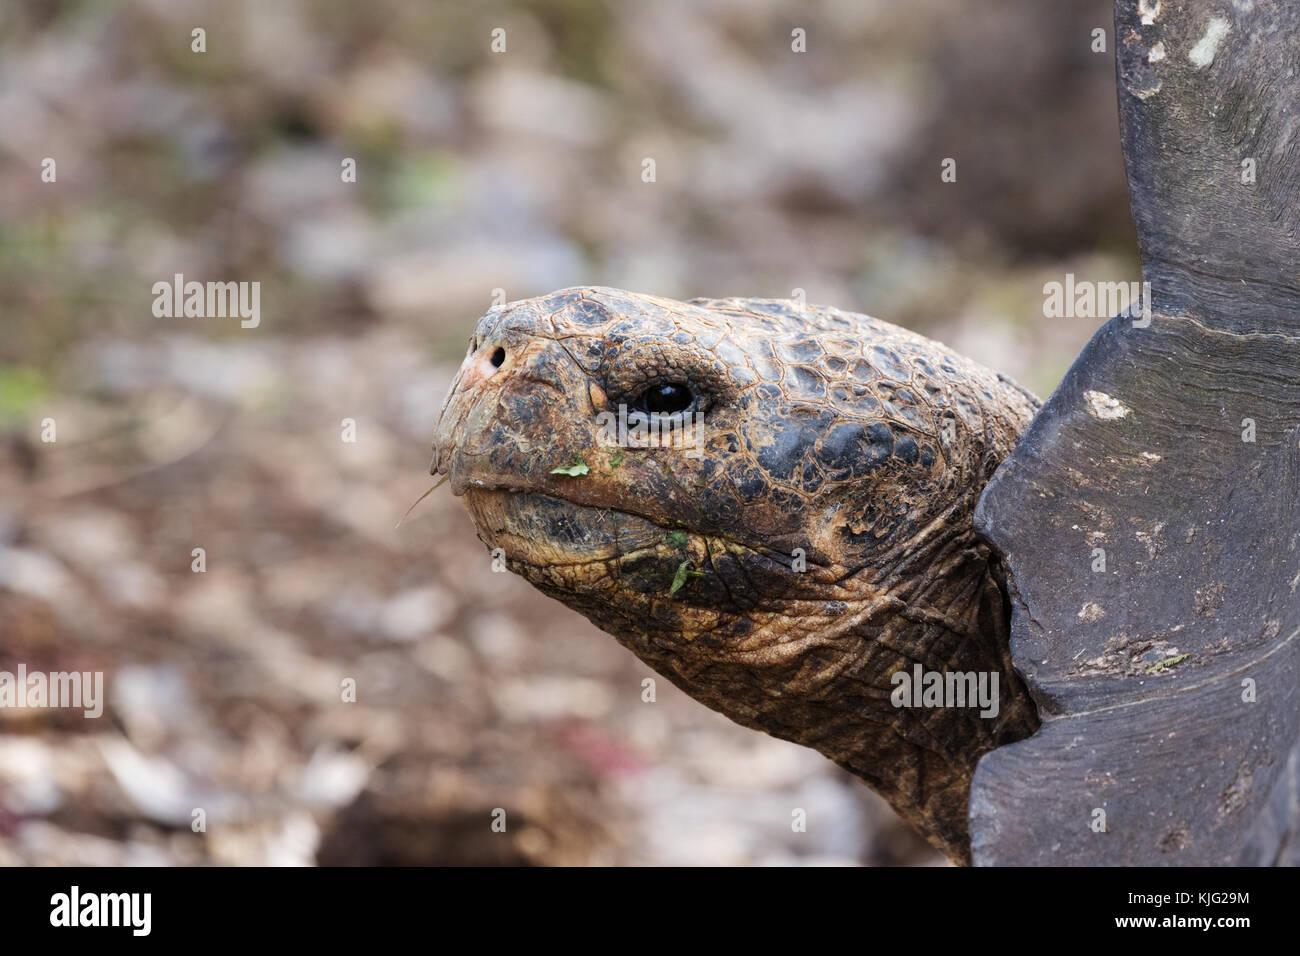 Galapagos Giant tortoise, Chelonoidis nigra,  head looking left, Galapagos Islands, Ecuador South America - Stock Image